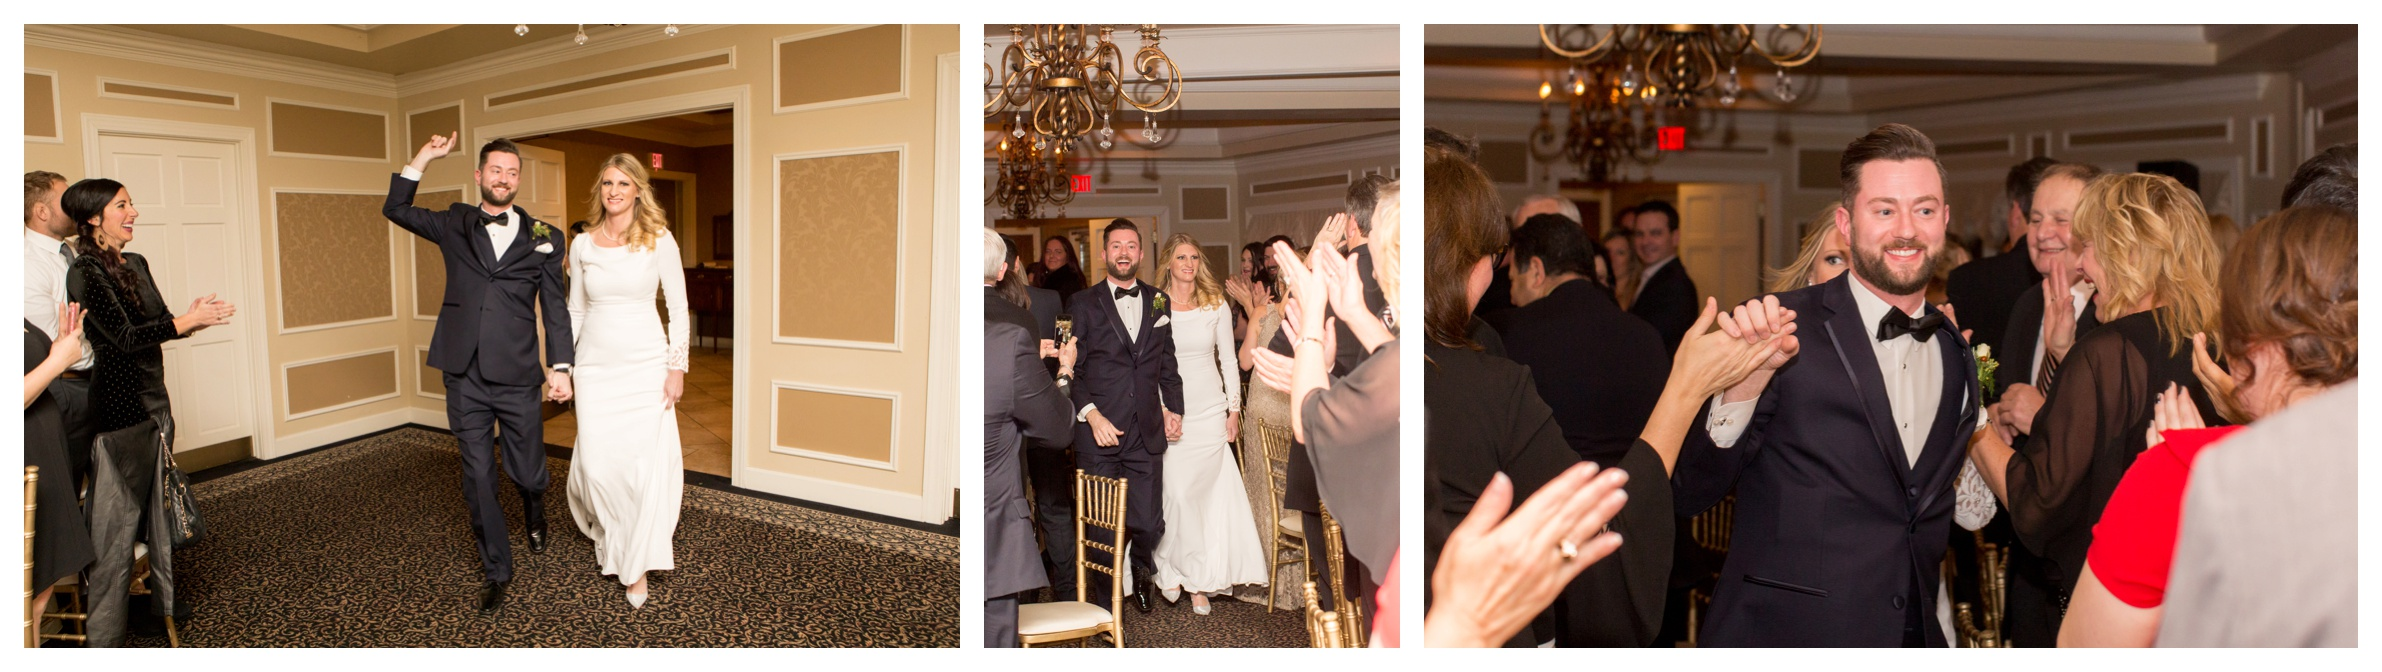 st-charles-country-club-wedding_0029.jpg